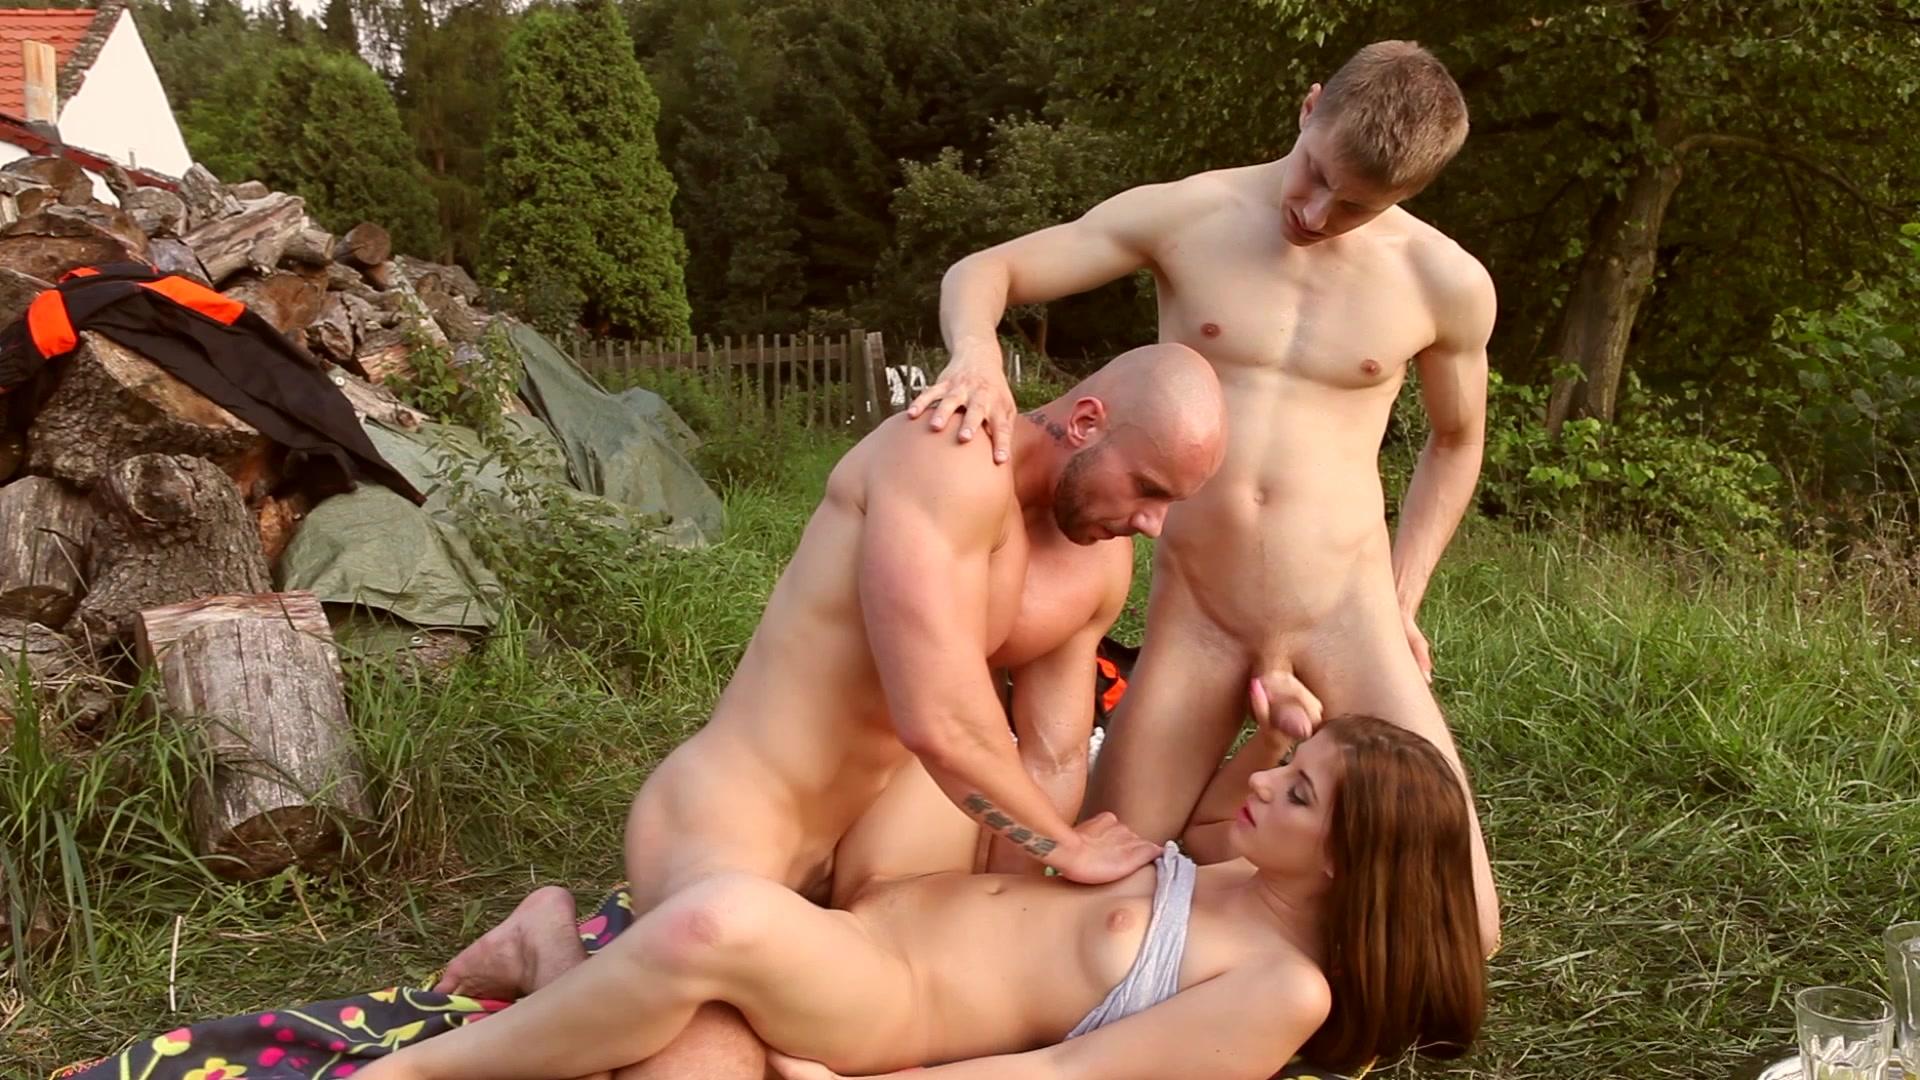 Порно на природе мужу изменяет